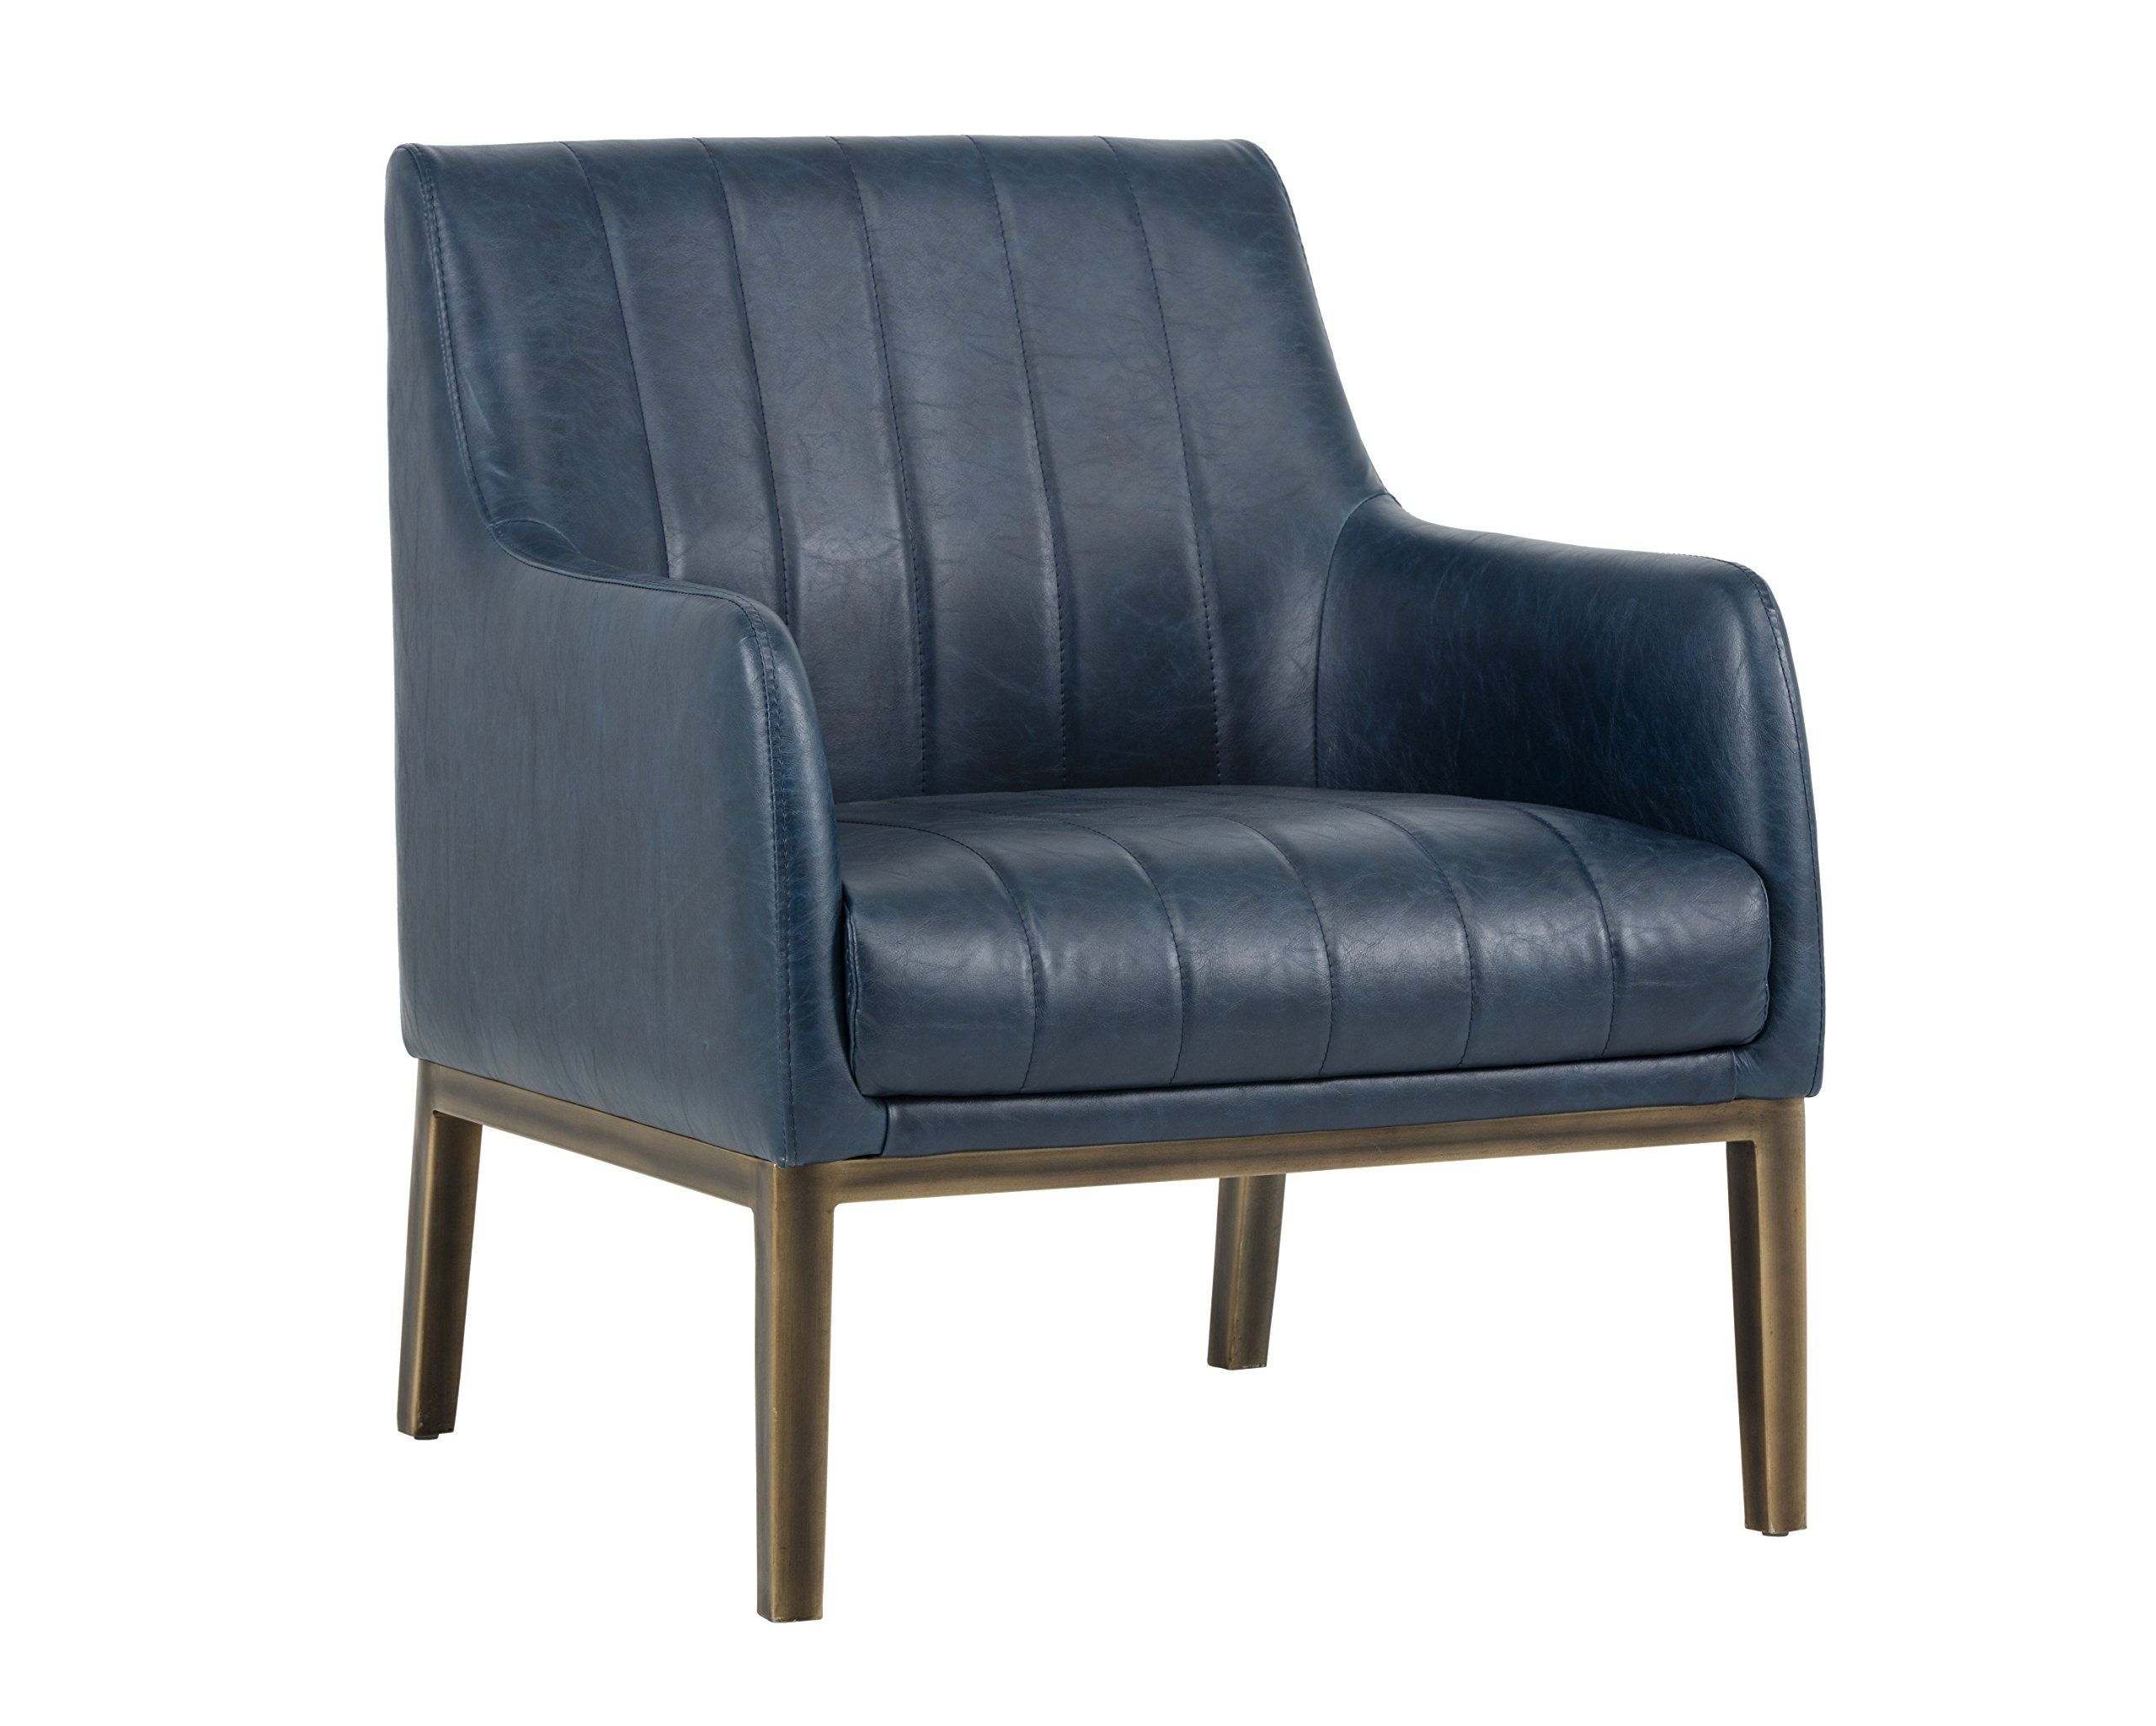 Sunpan Modern Sunpan Wolfe Lounge Rustic Bronze-Vintage Blue Chair Blue Blue by Sunpan Modern